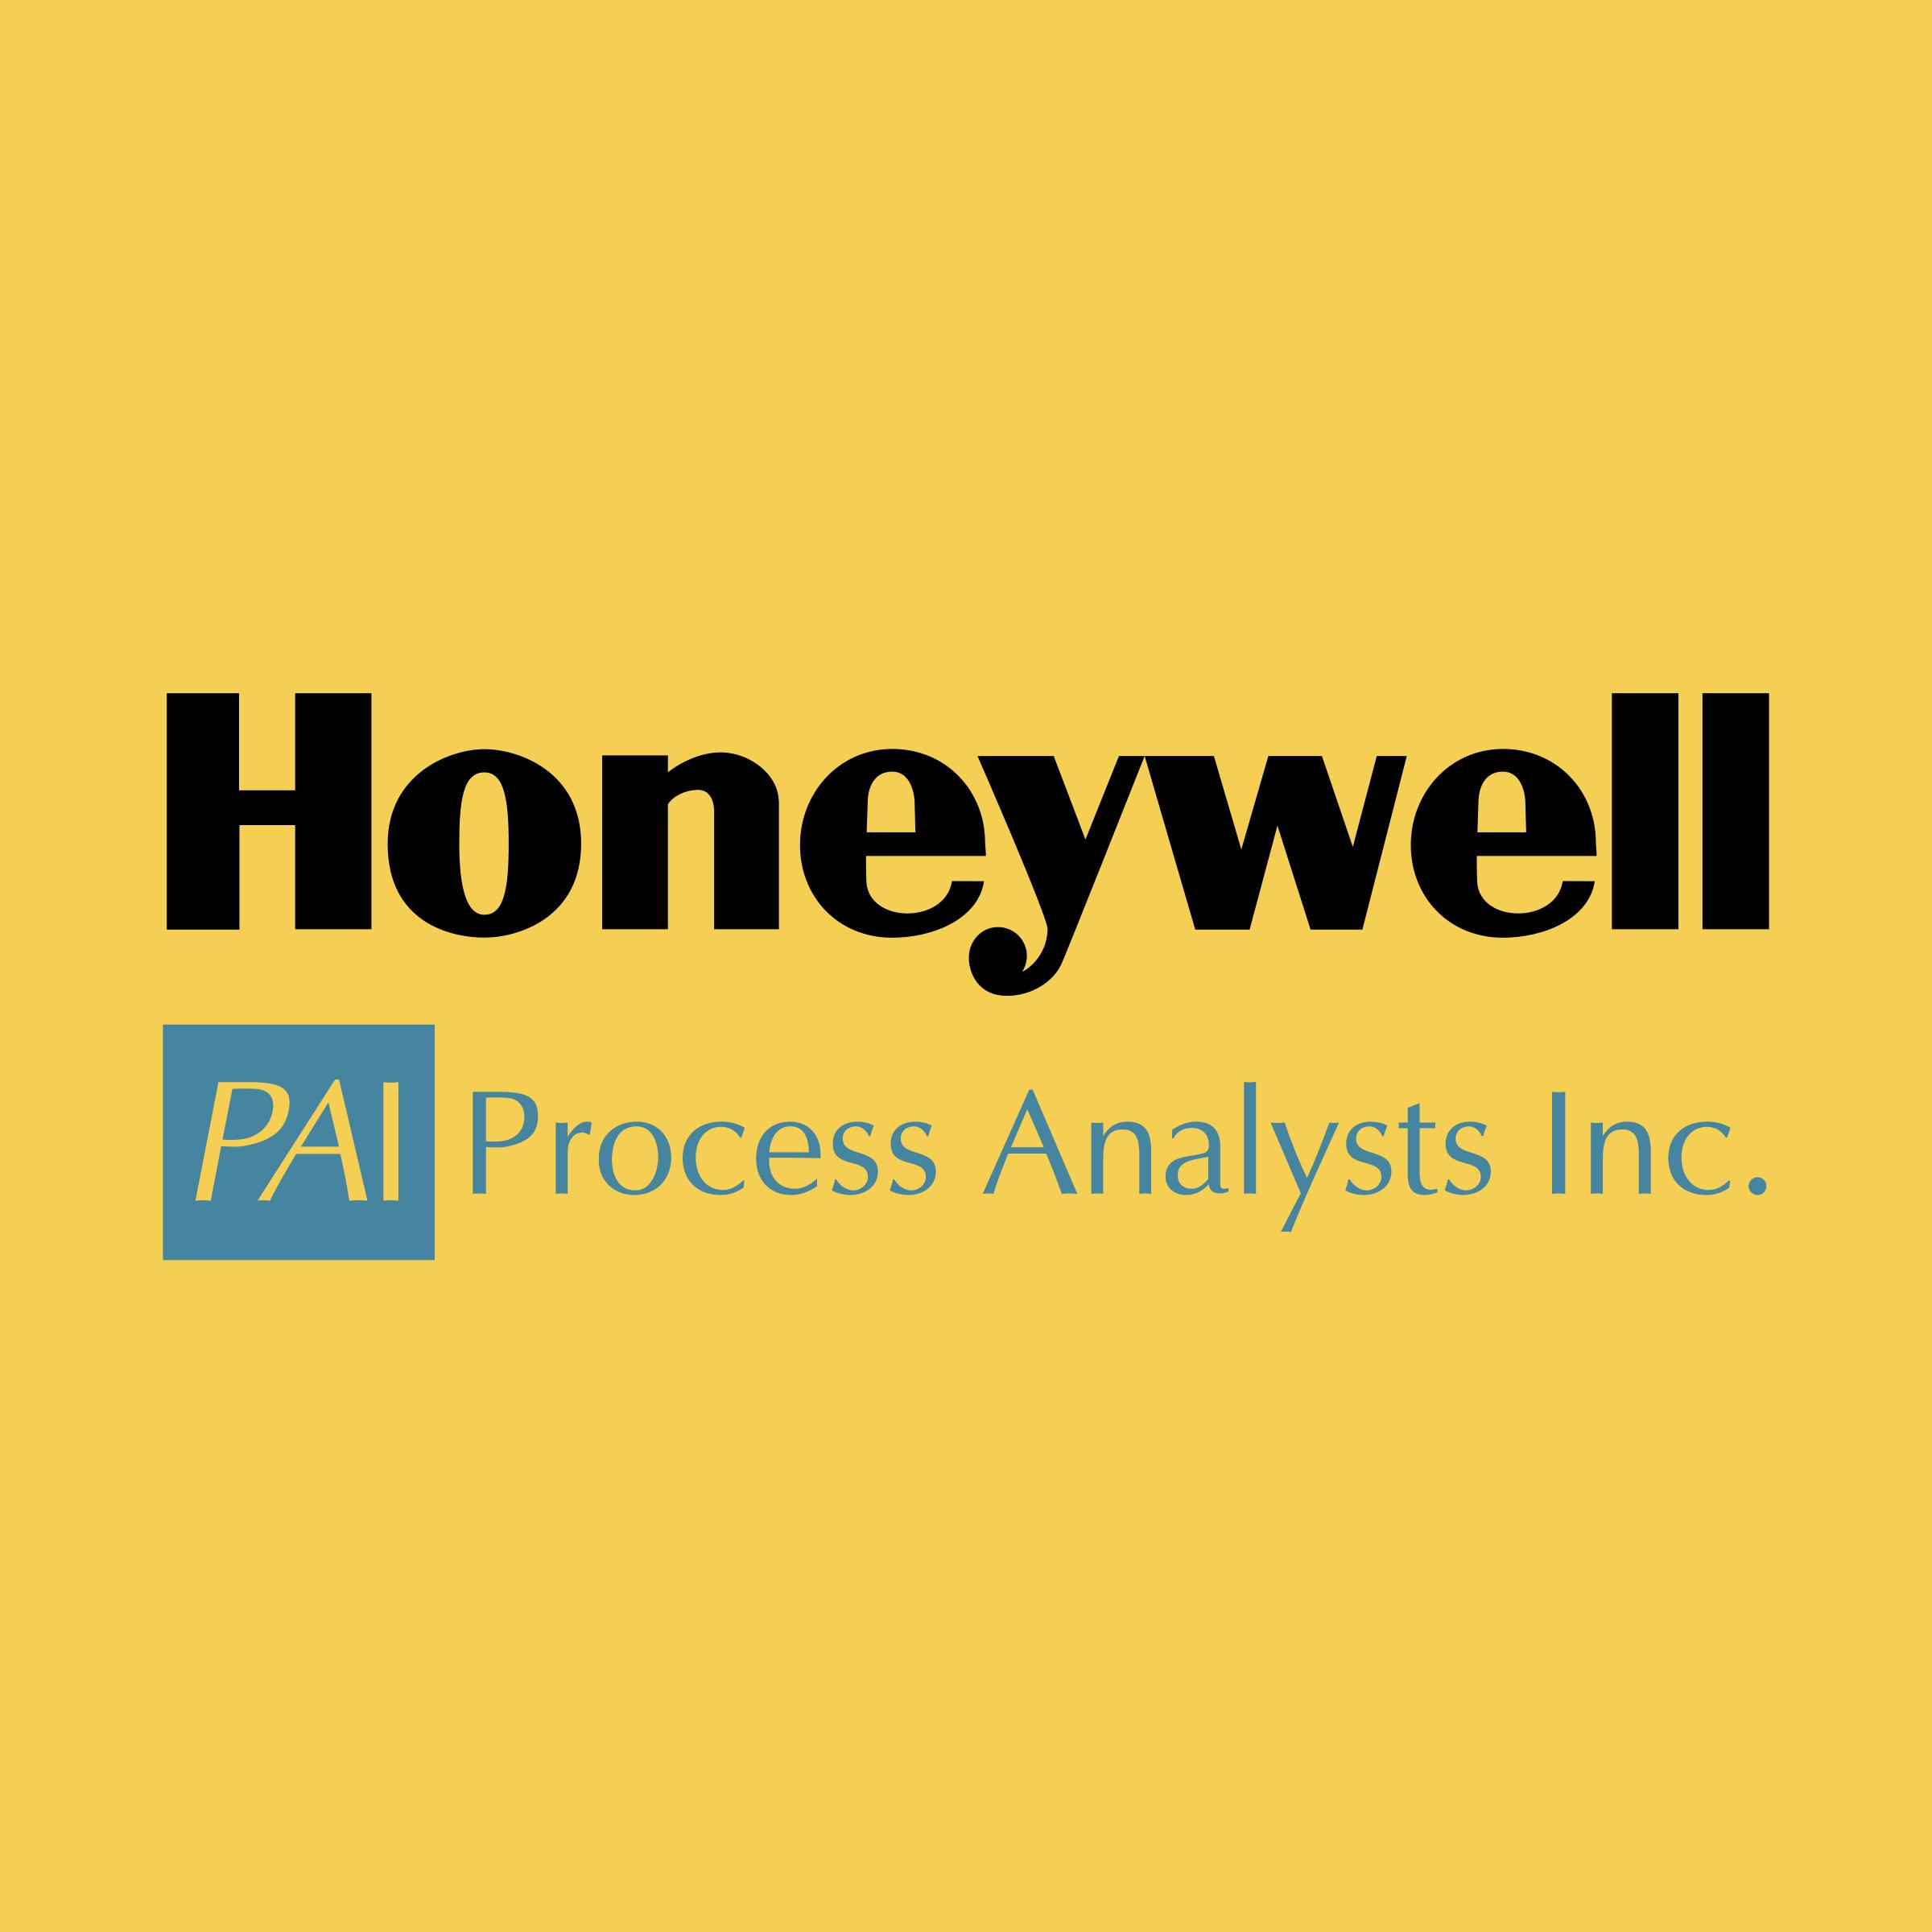 Honeywell PAI Logo PNG Transparent & SVG Vector - Freebie Supply